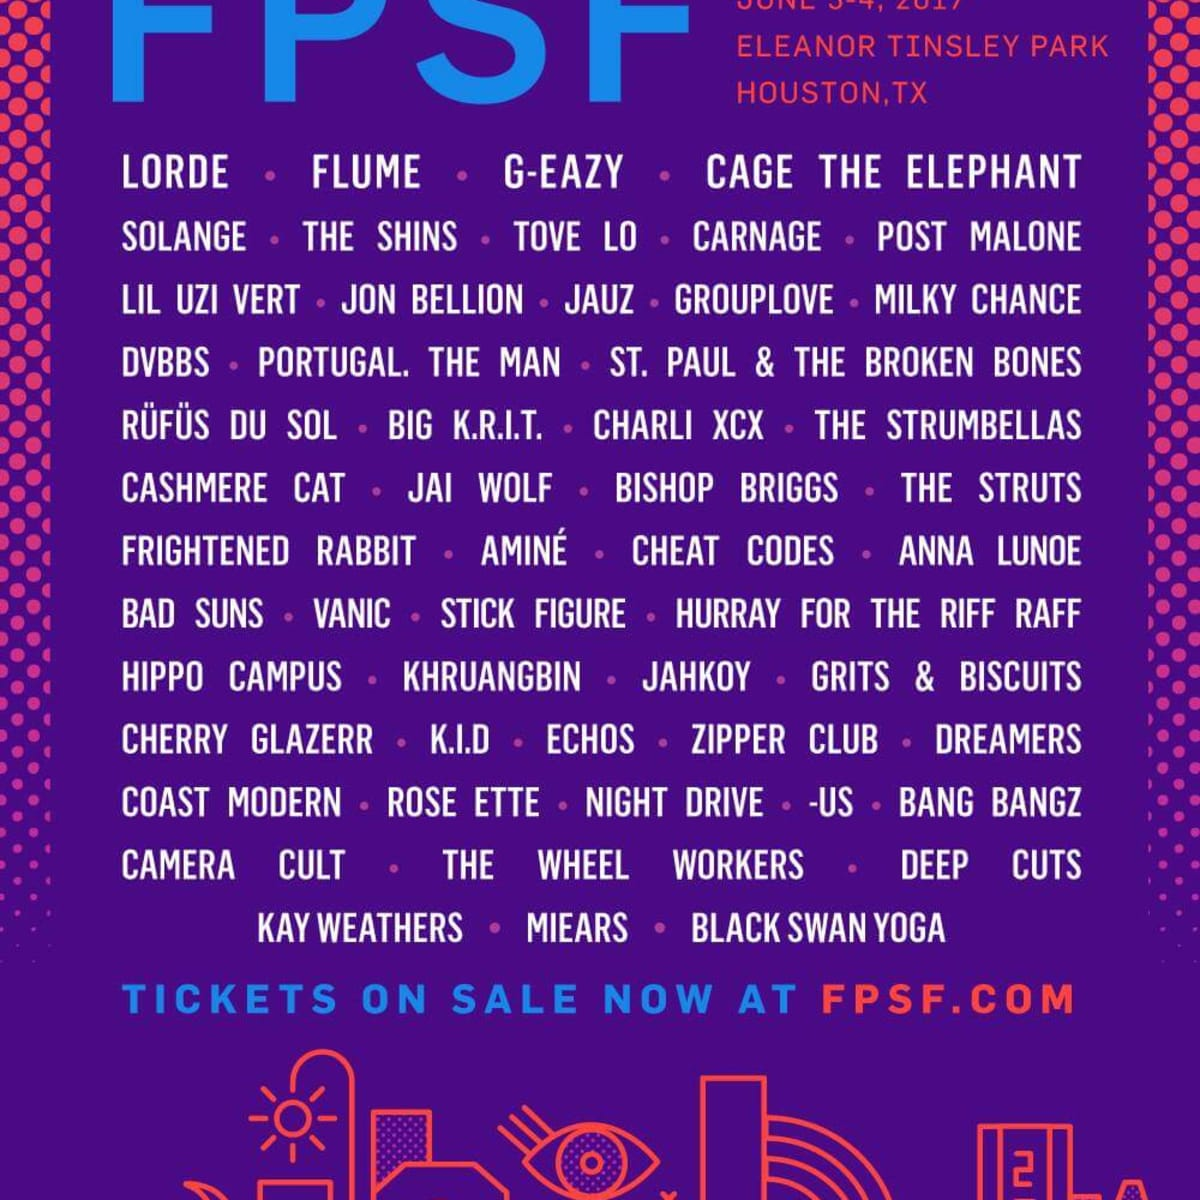 Houston, FPSF 2017 music lineup, Feb 2017, flyer